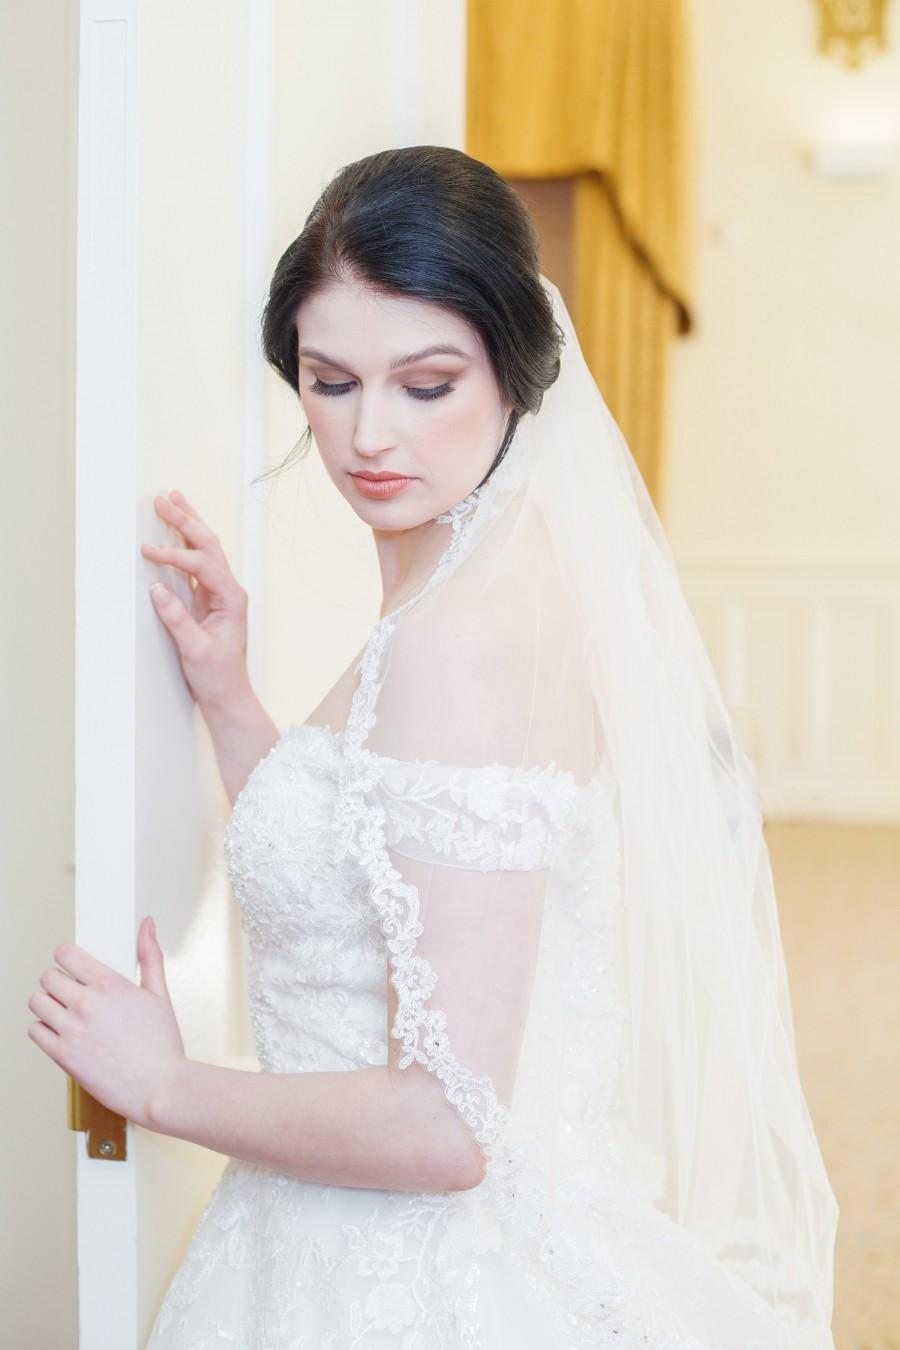 Wedding - Lace Edge Veil, One Tier Lace Edge Wedding Veil, Single Tier Lace Edge Bridal Veil, Lace Edge, 1 Tier Veil, Ivory Wedding Veil